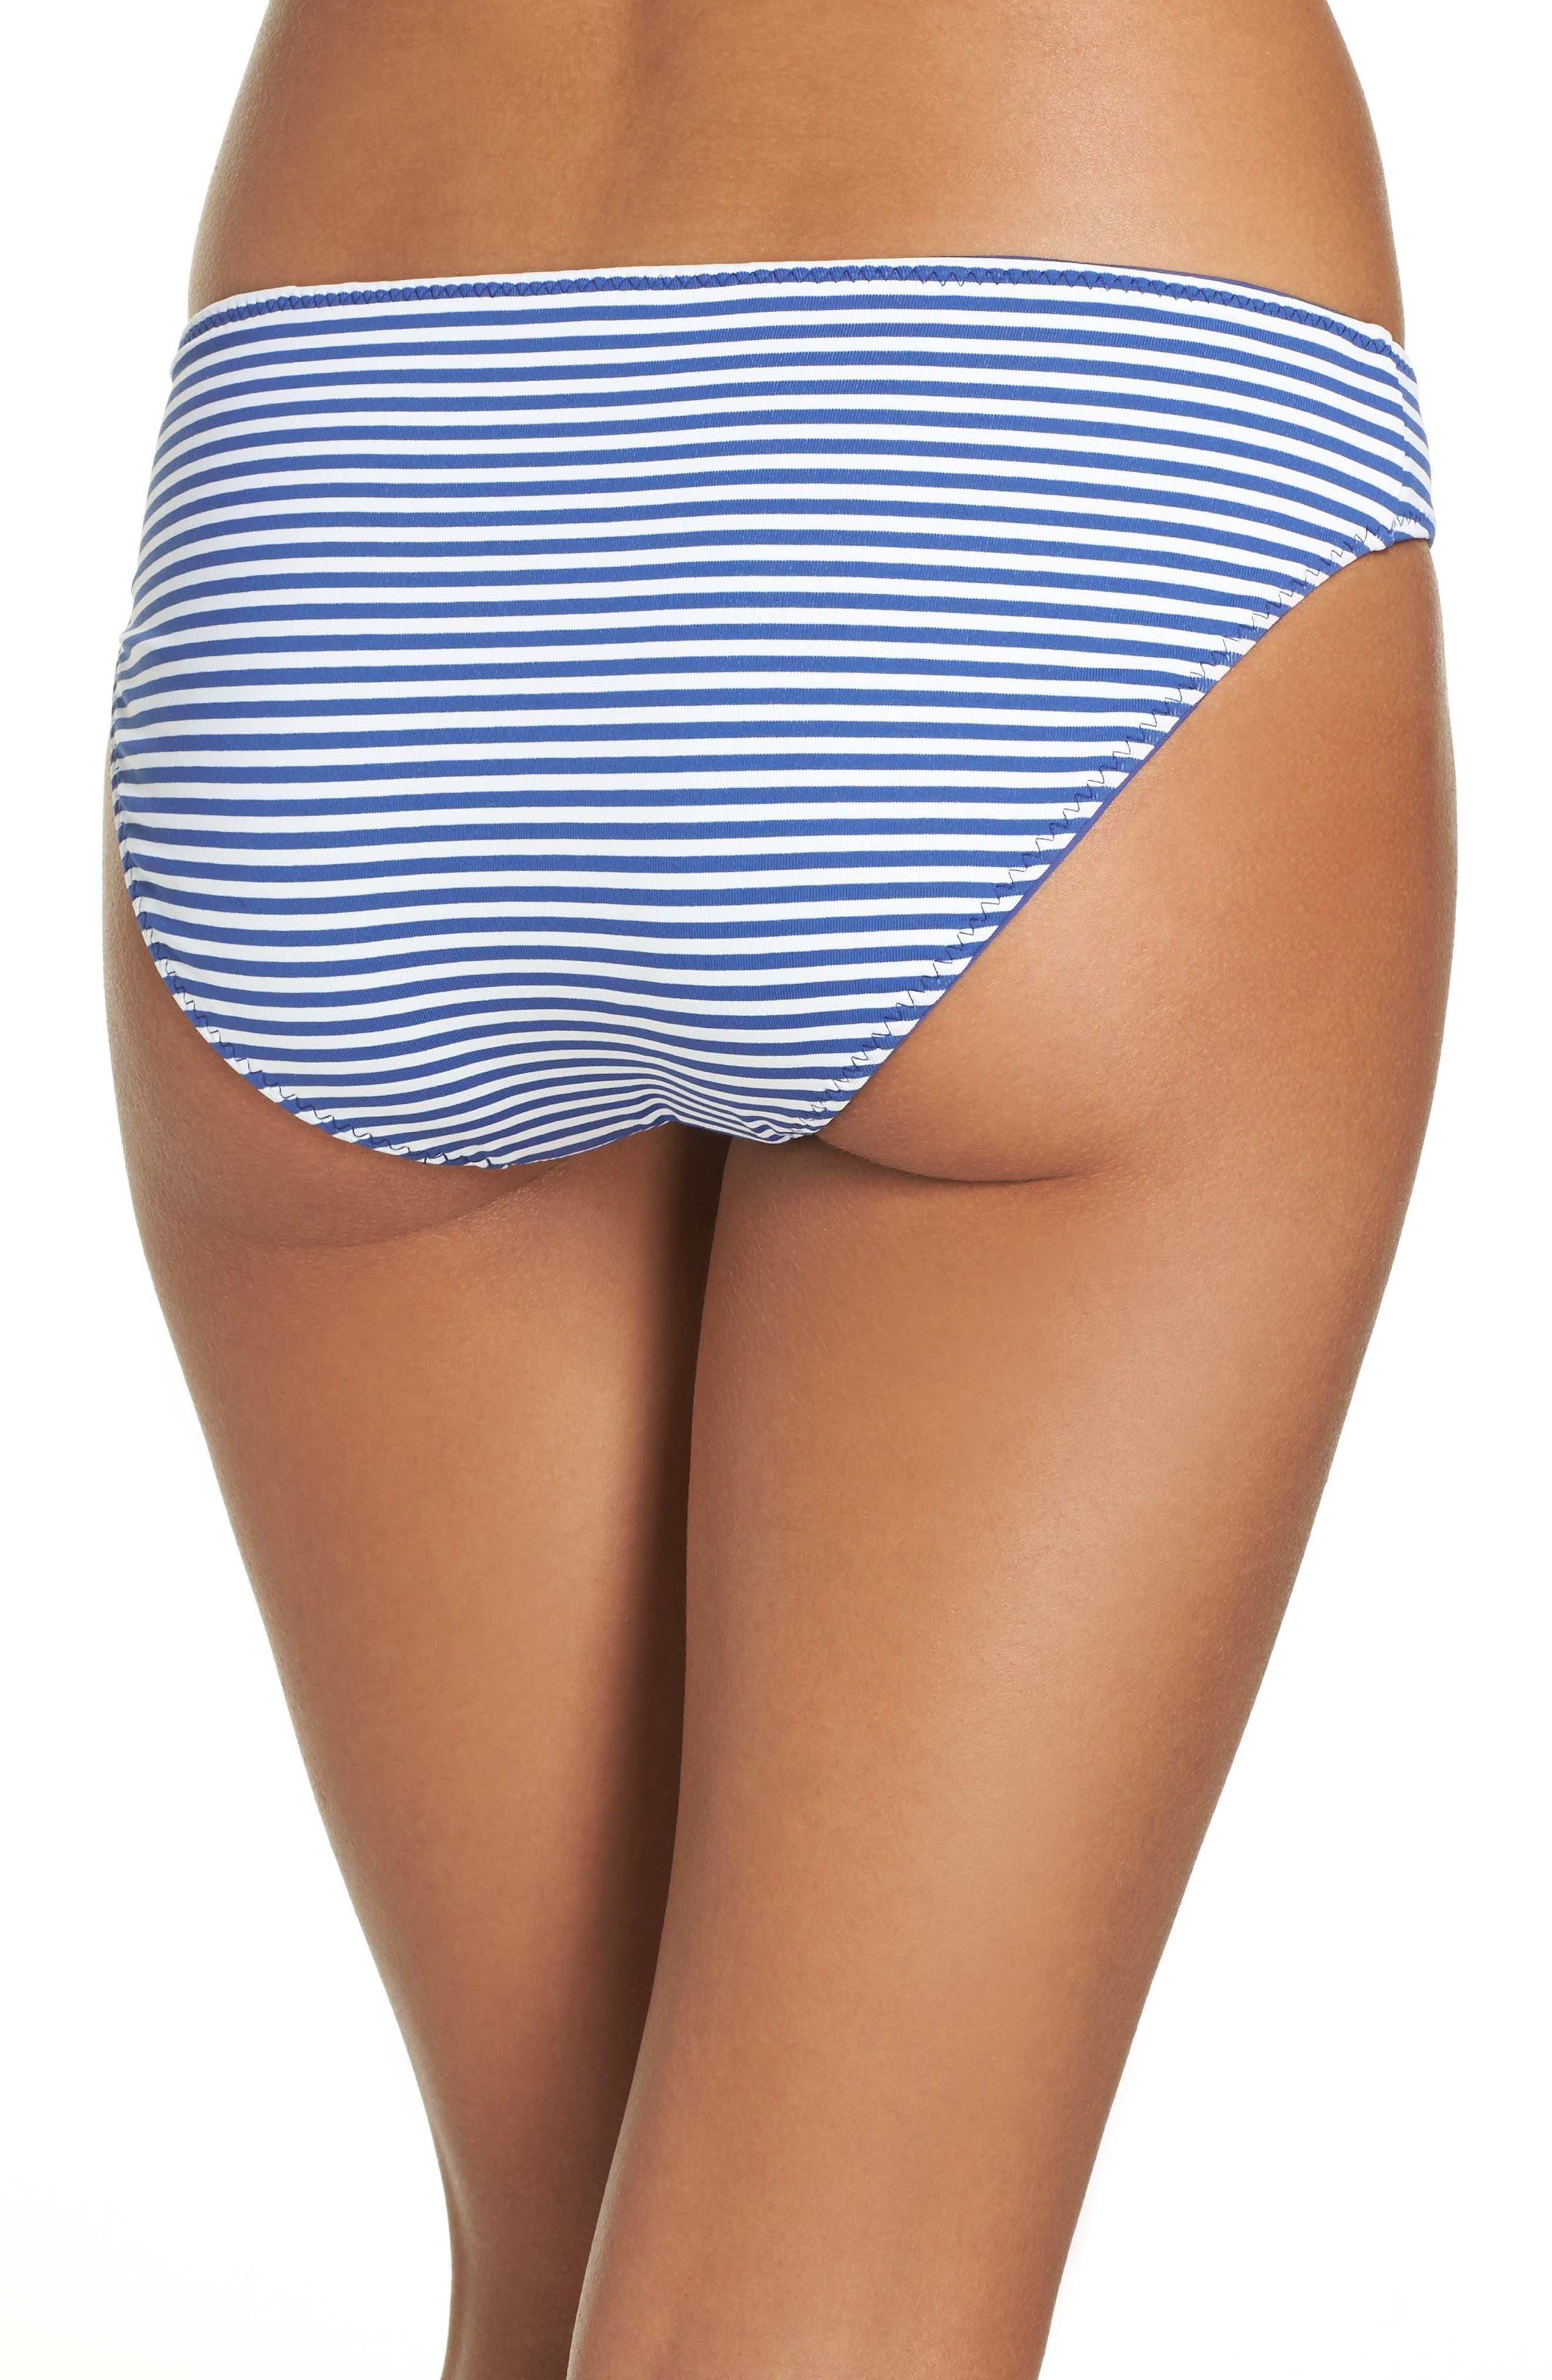 Alternate Image 3  - Tommy Bahama Reversible Hipster Bikini Bottoms